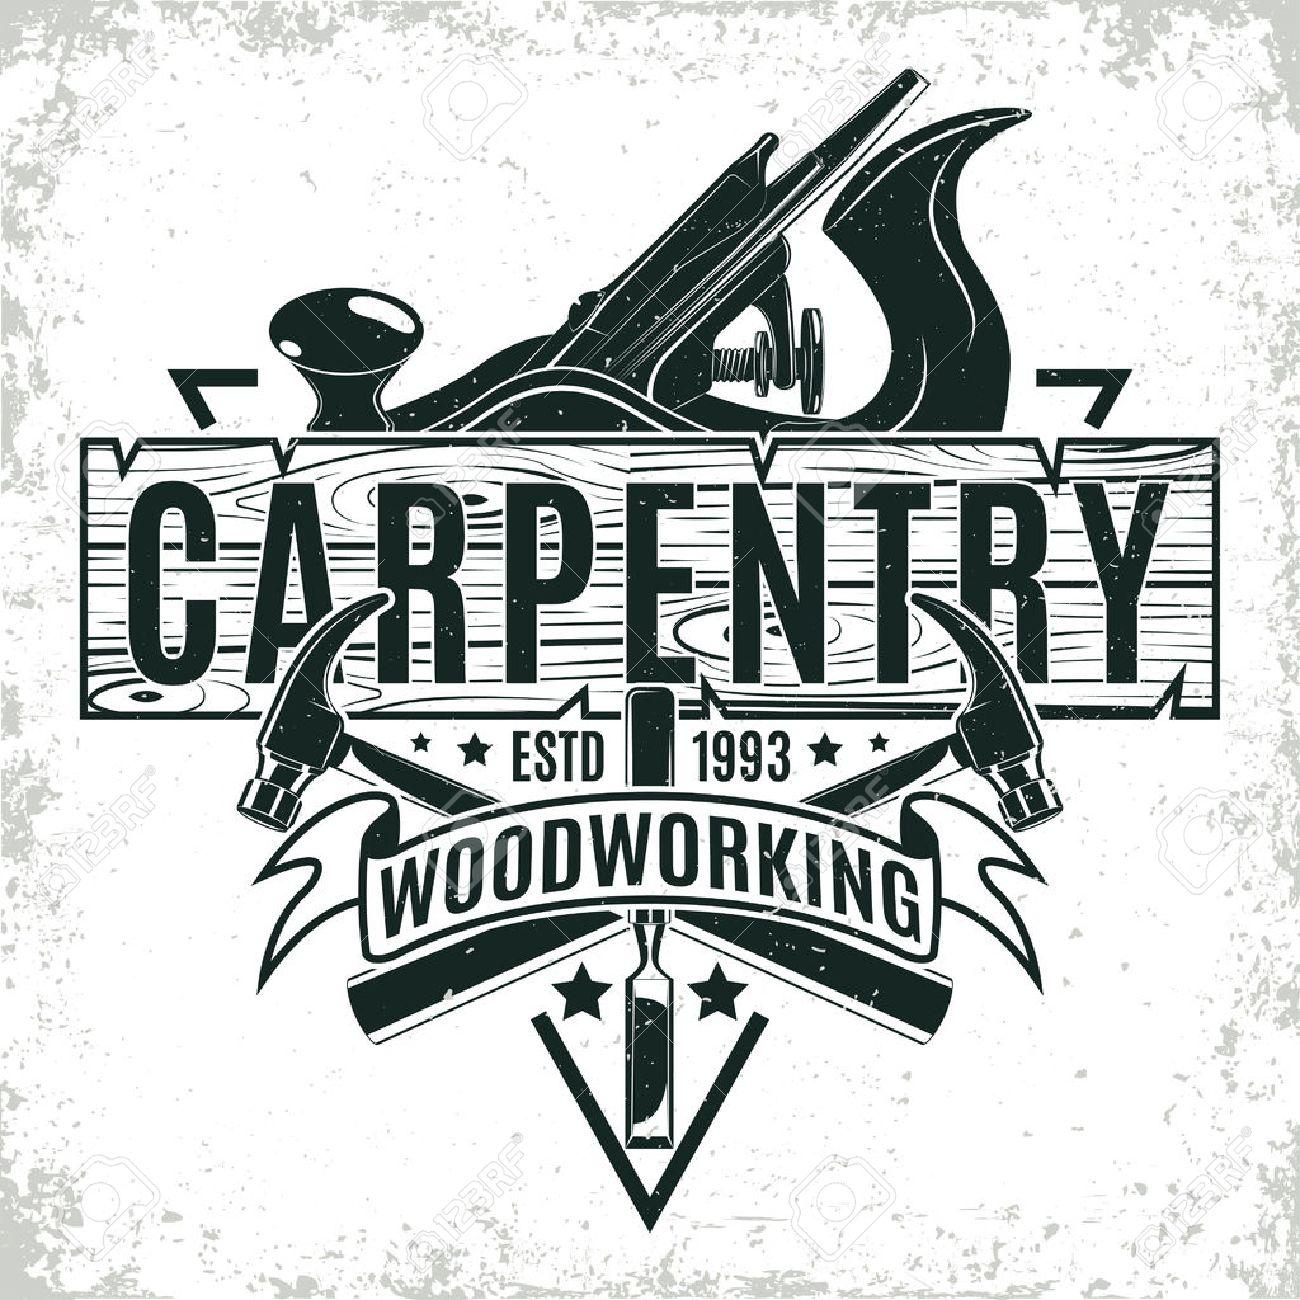 Vintage woodworking logo design, grange print stamp, creative